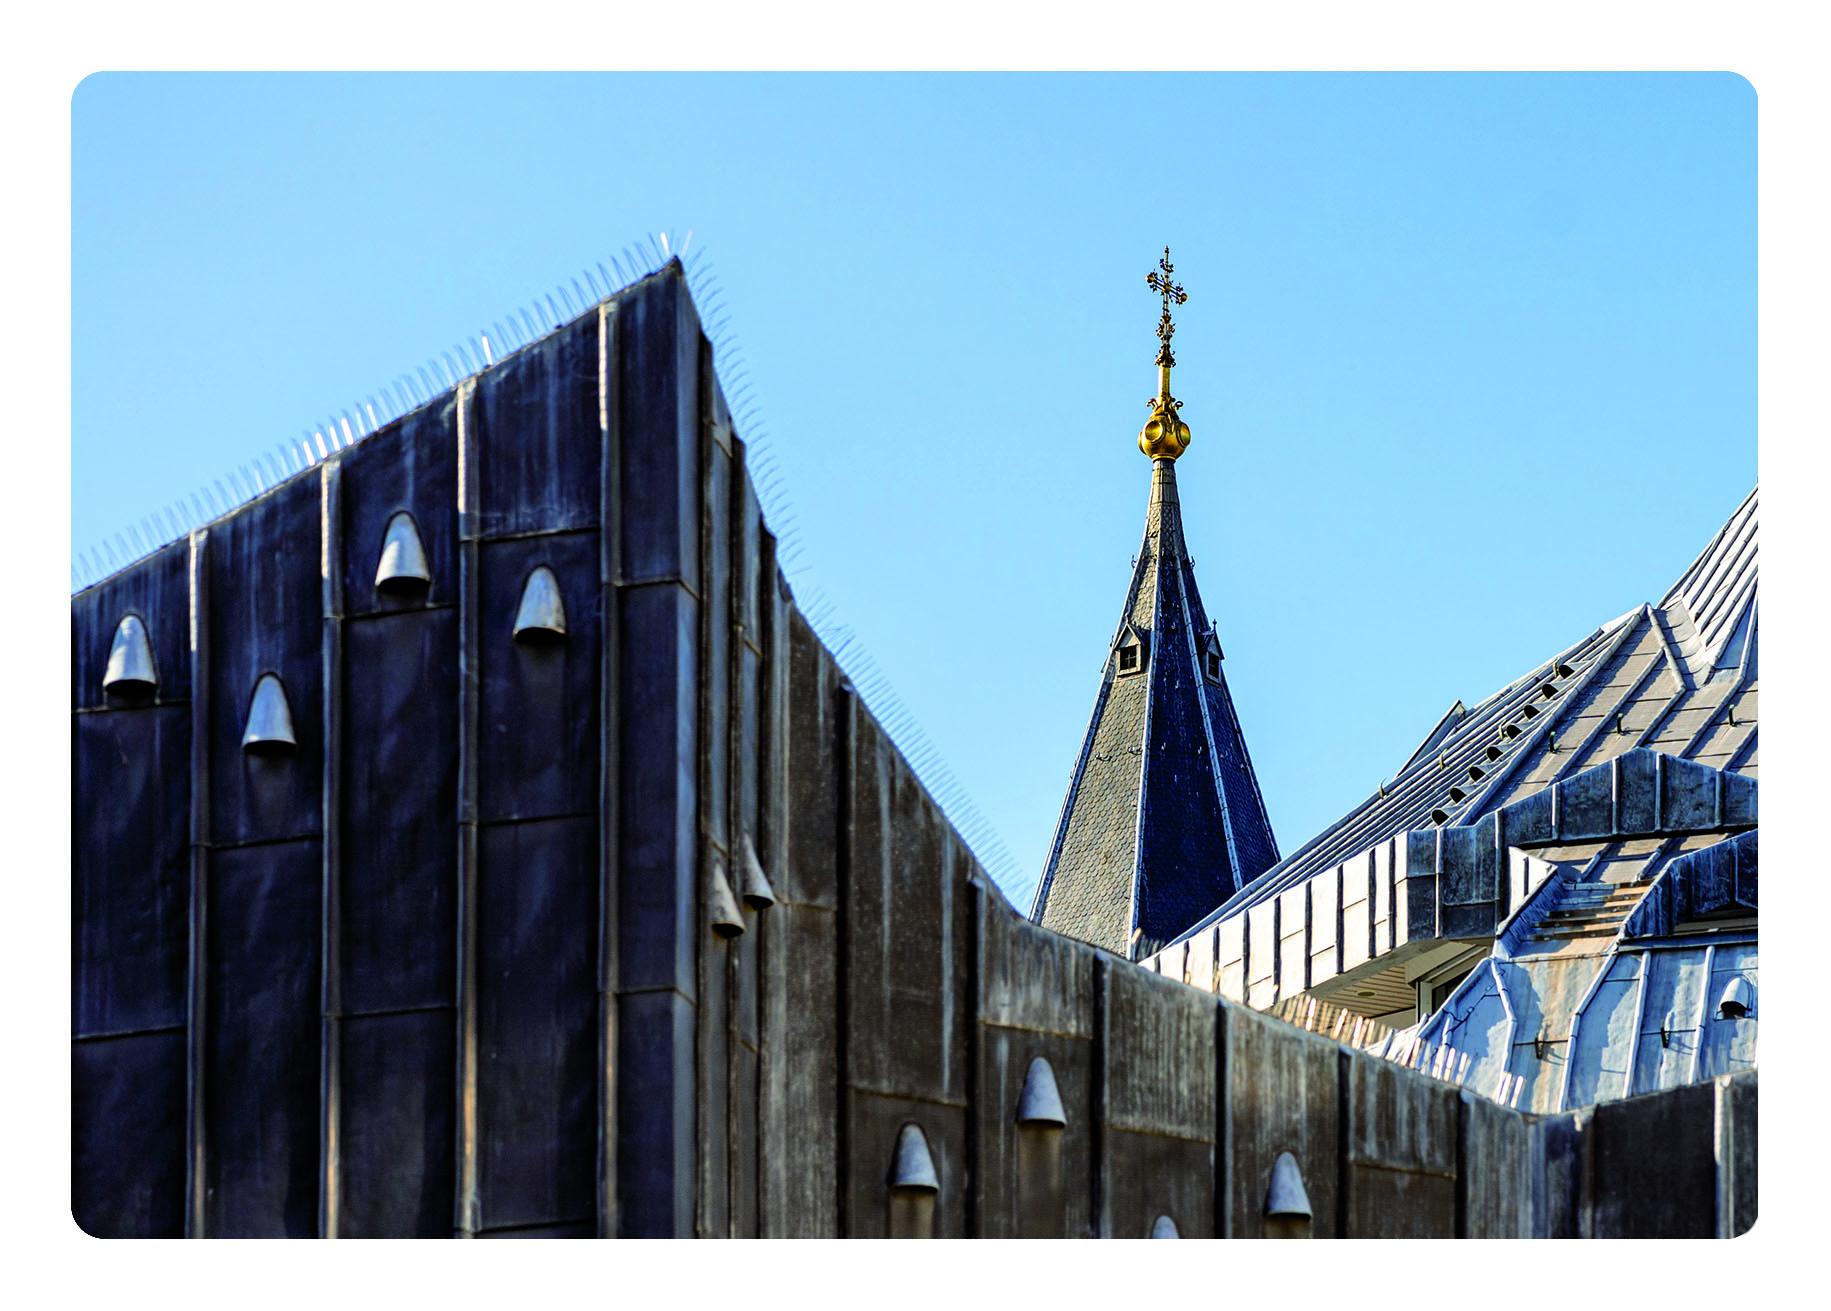 querformat-fotografie - Achim Katzberg - 04_1 Postkarten_Mainz_Domspitze